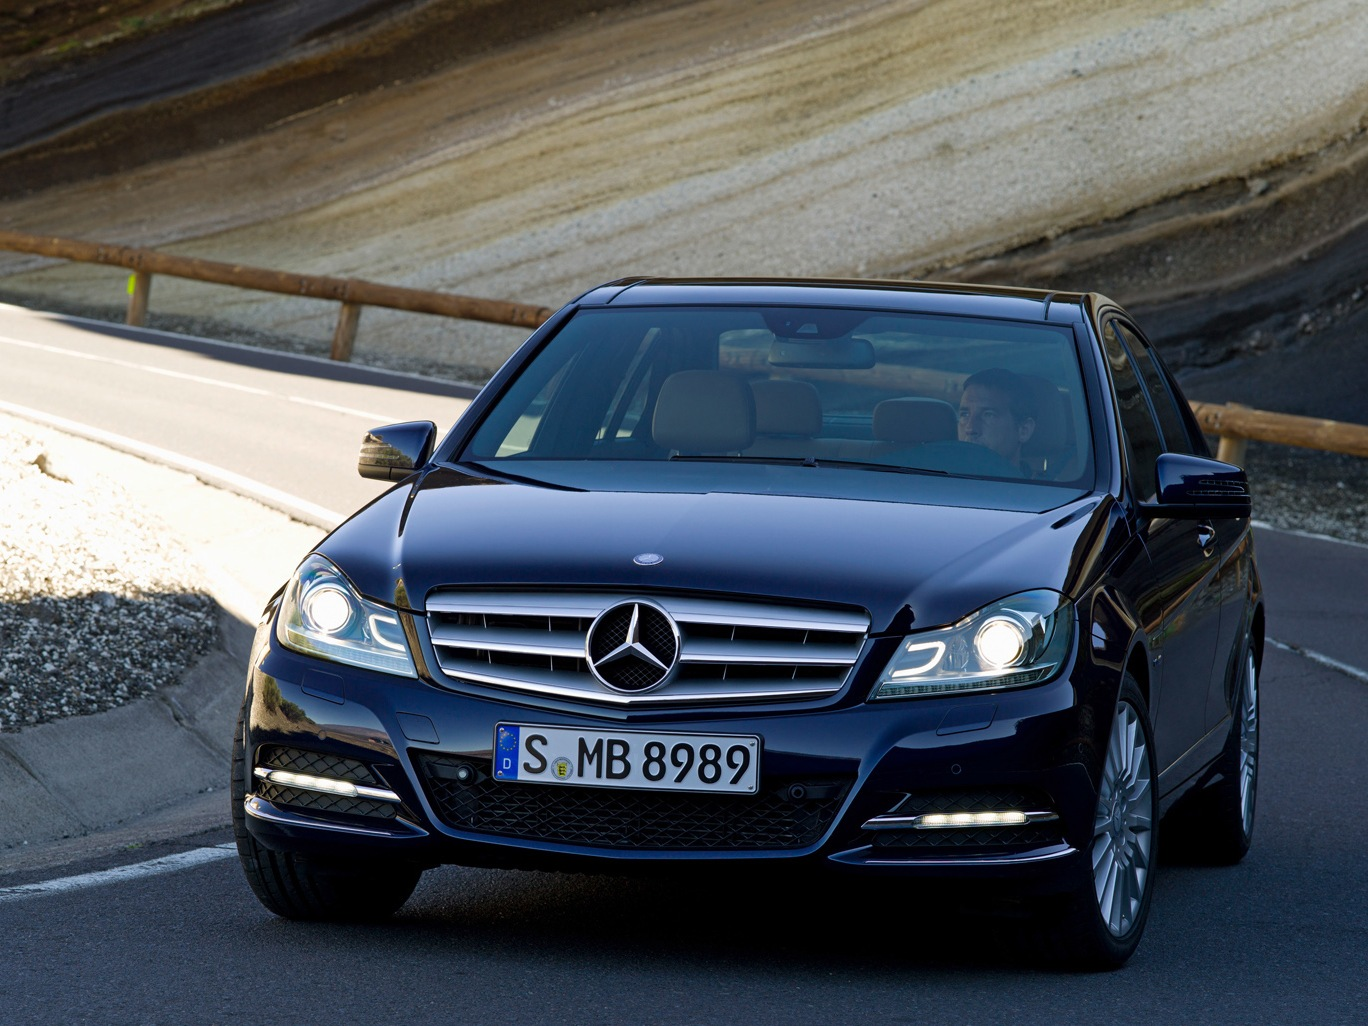 Mercedes c180 фото